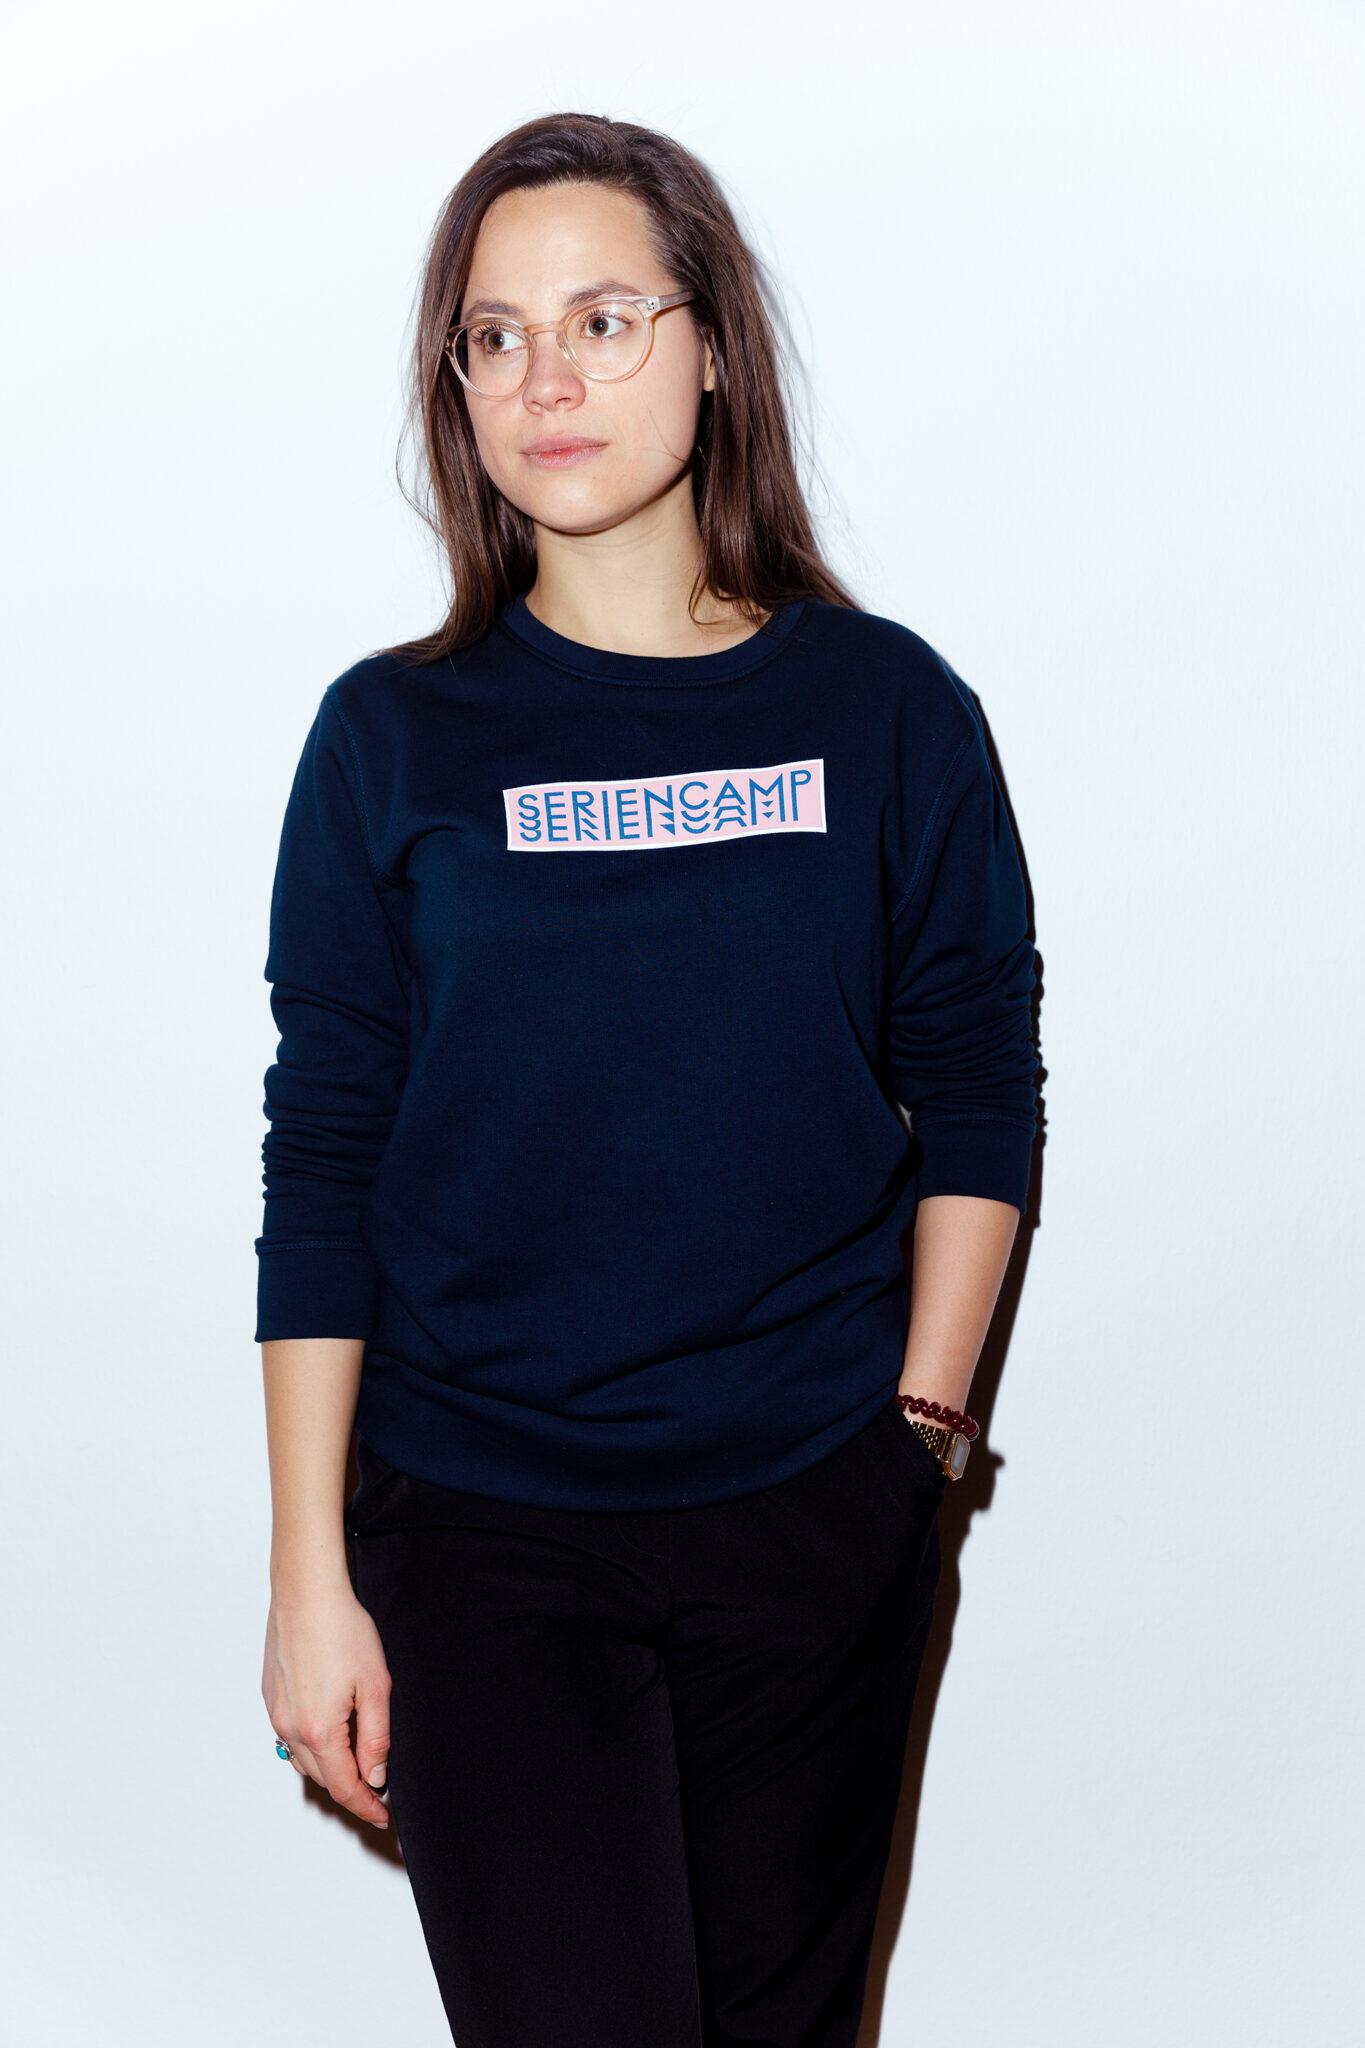 Seriencamp Festival 2020: Merch Sweater M